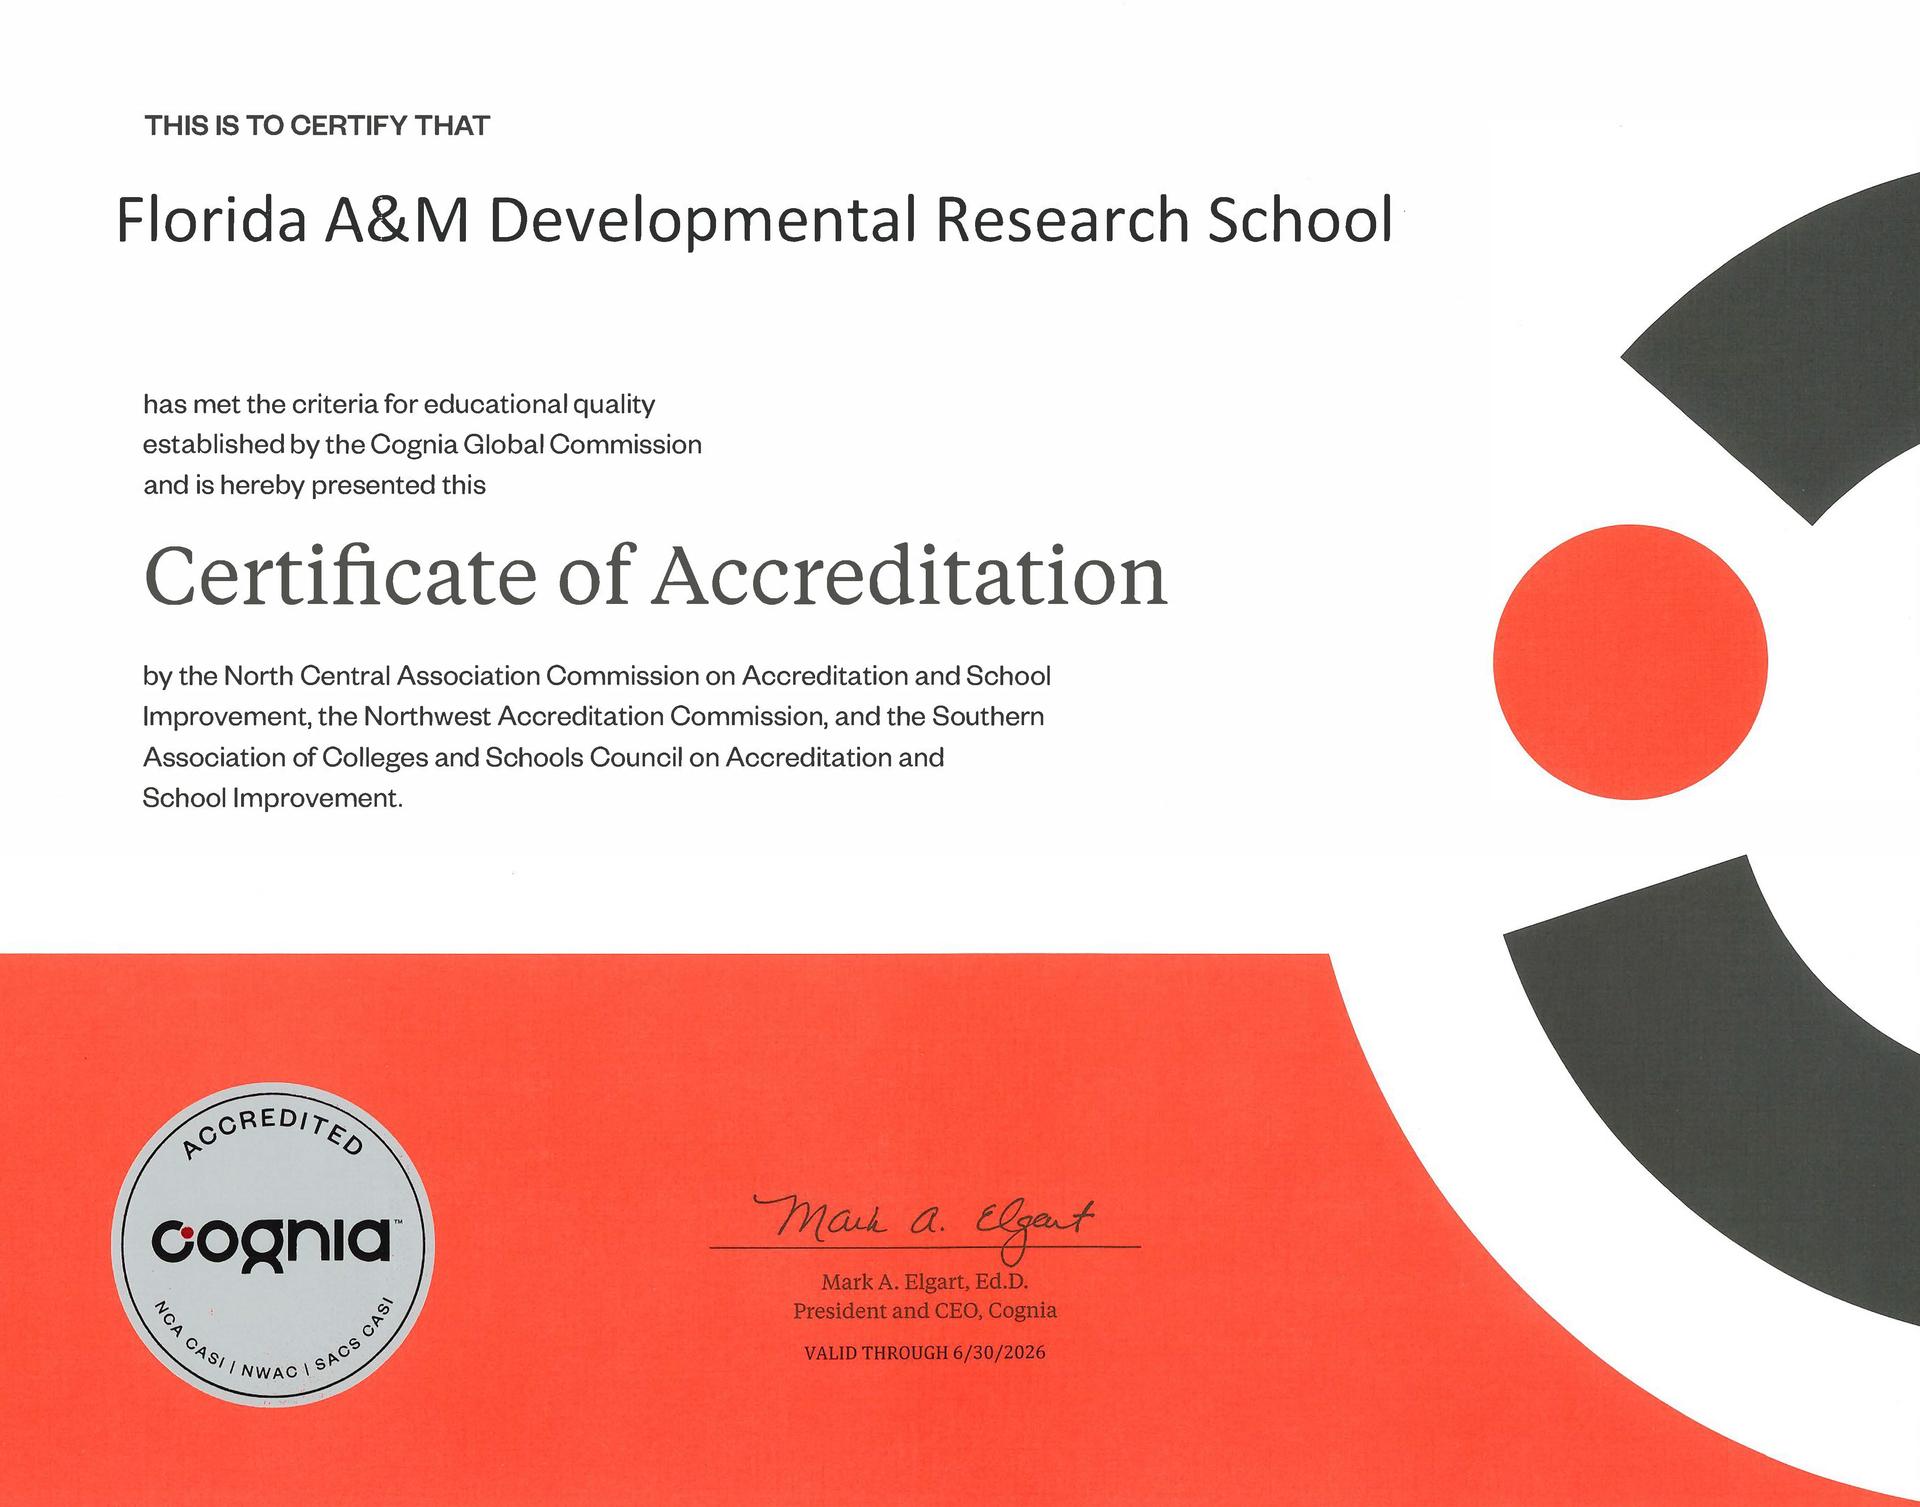 FAMU DRS Accreditation Certificate 2021-2026